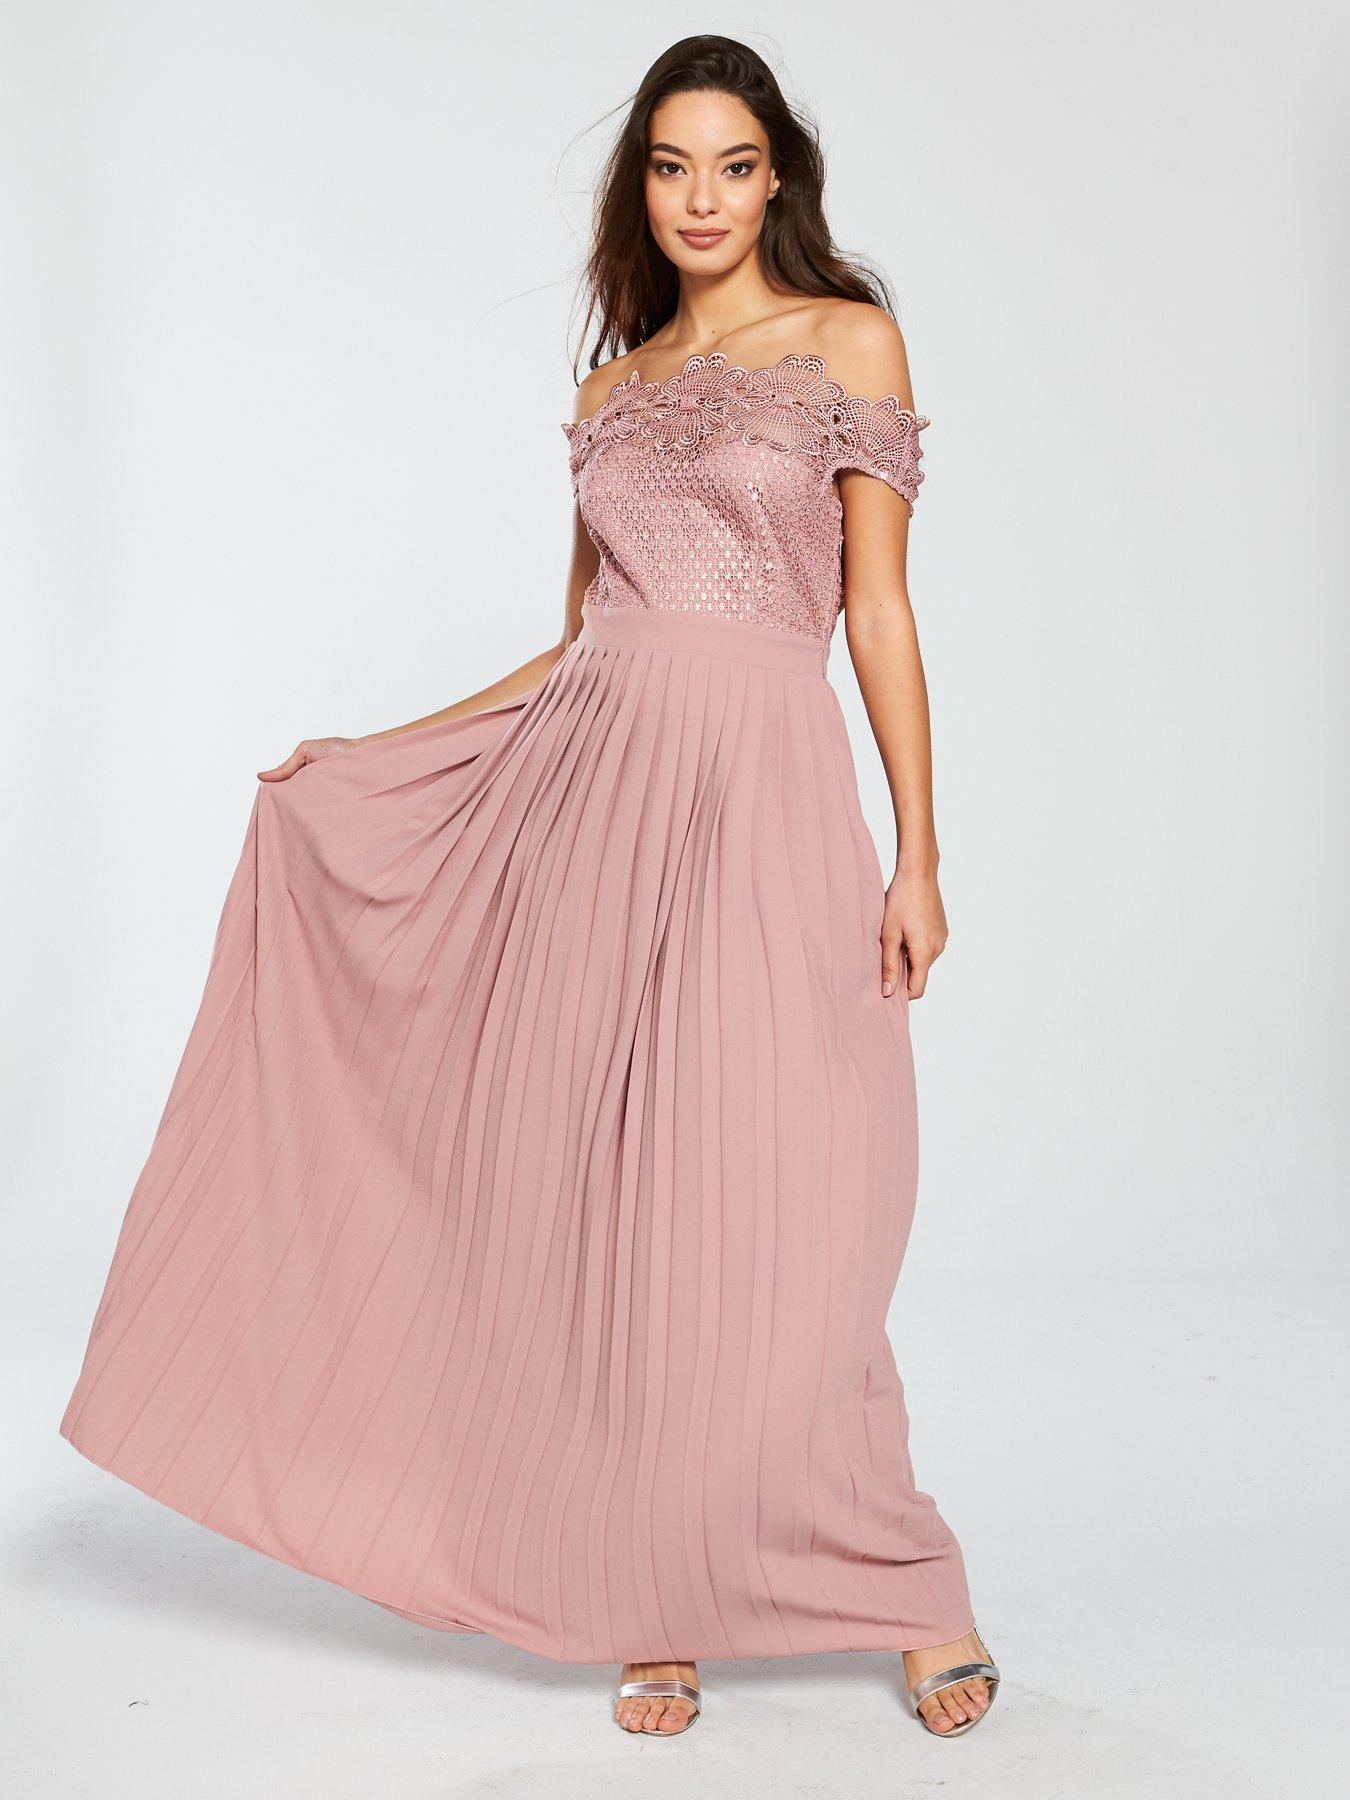 Clearance | Sleeveless | Dresses | Women | www